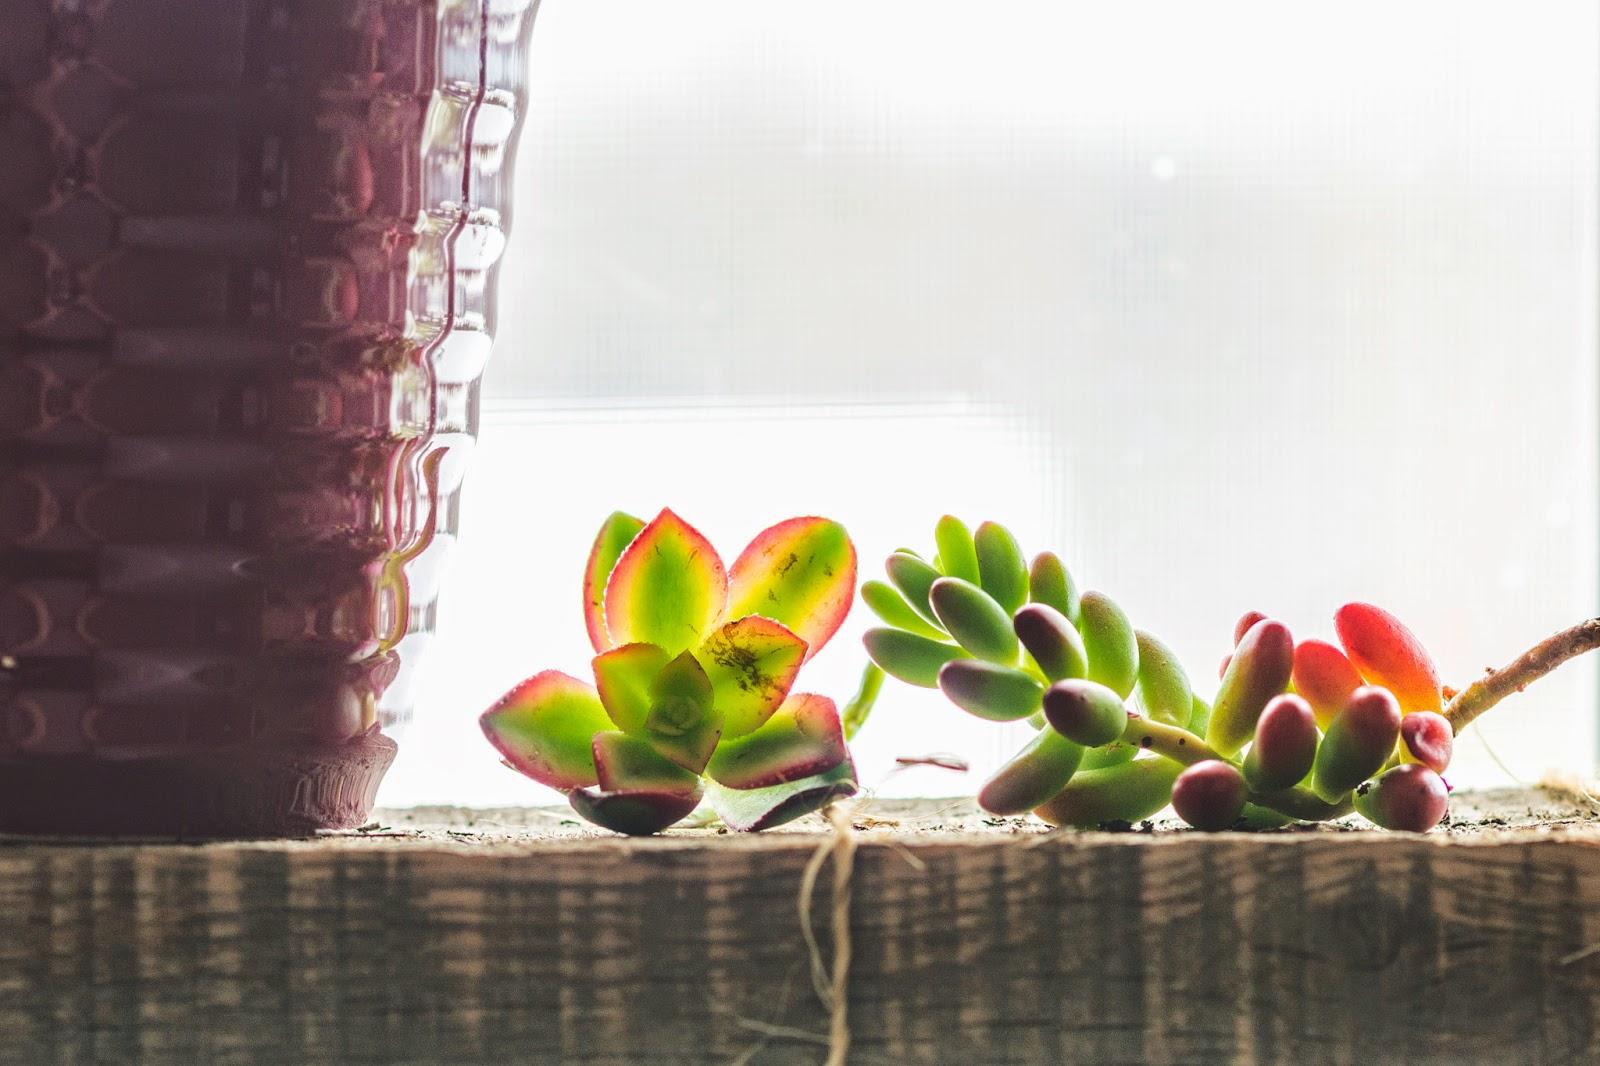 plants0032.jpg